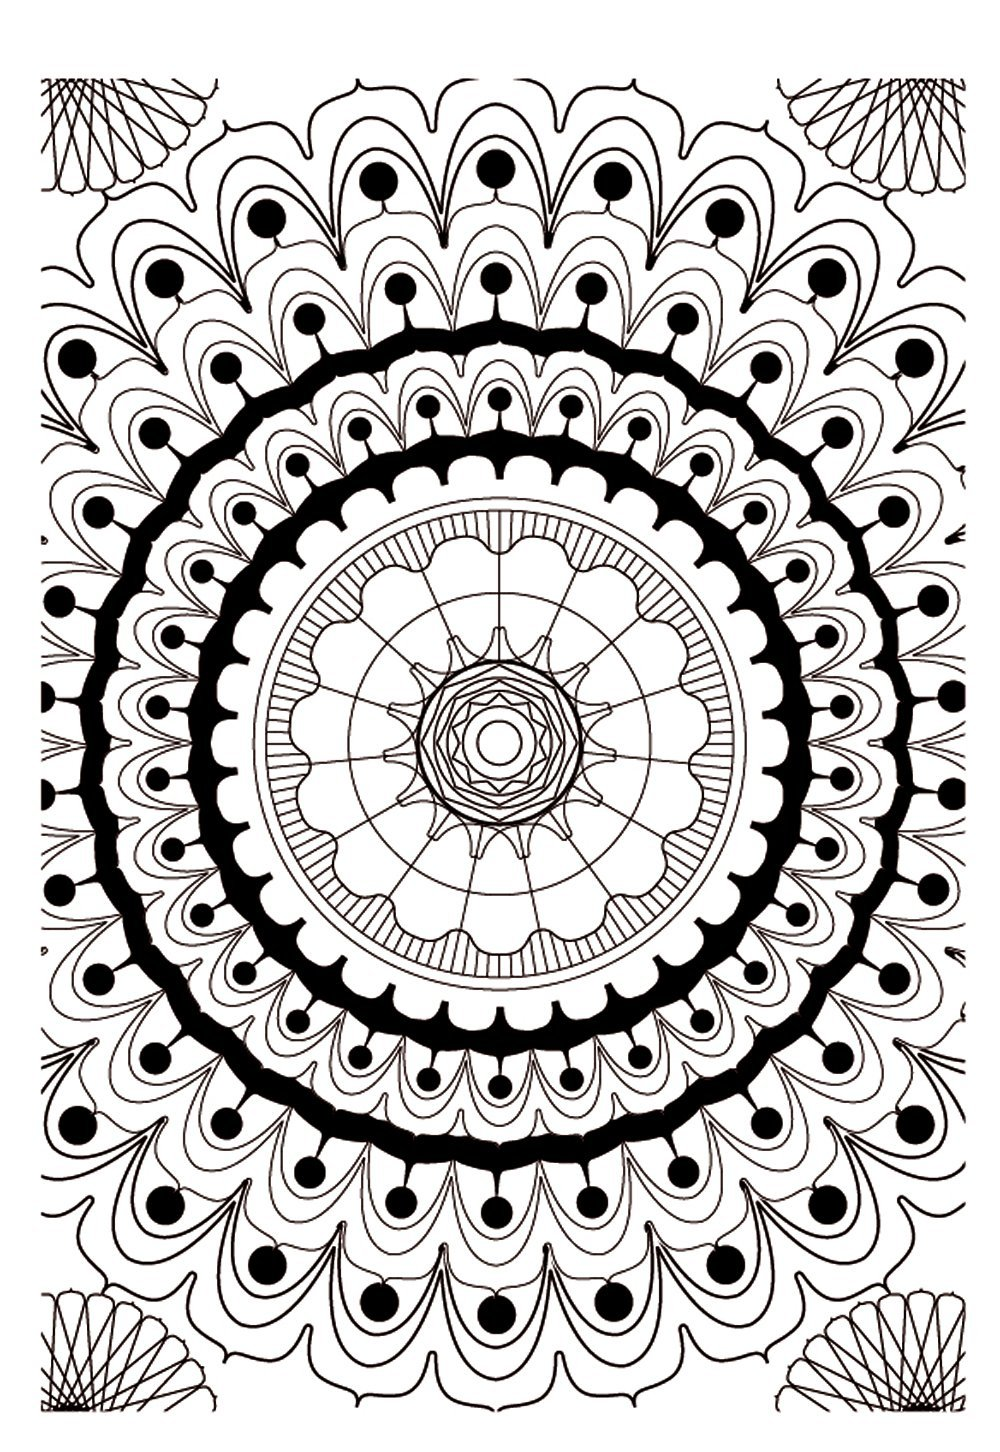 Mandala 2 - M&alas Adult Coloring Pages